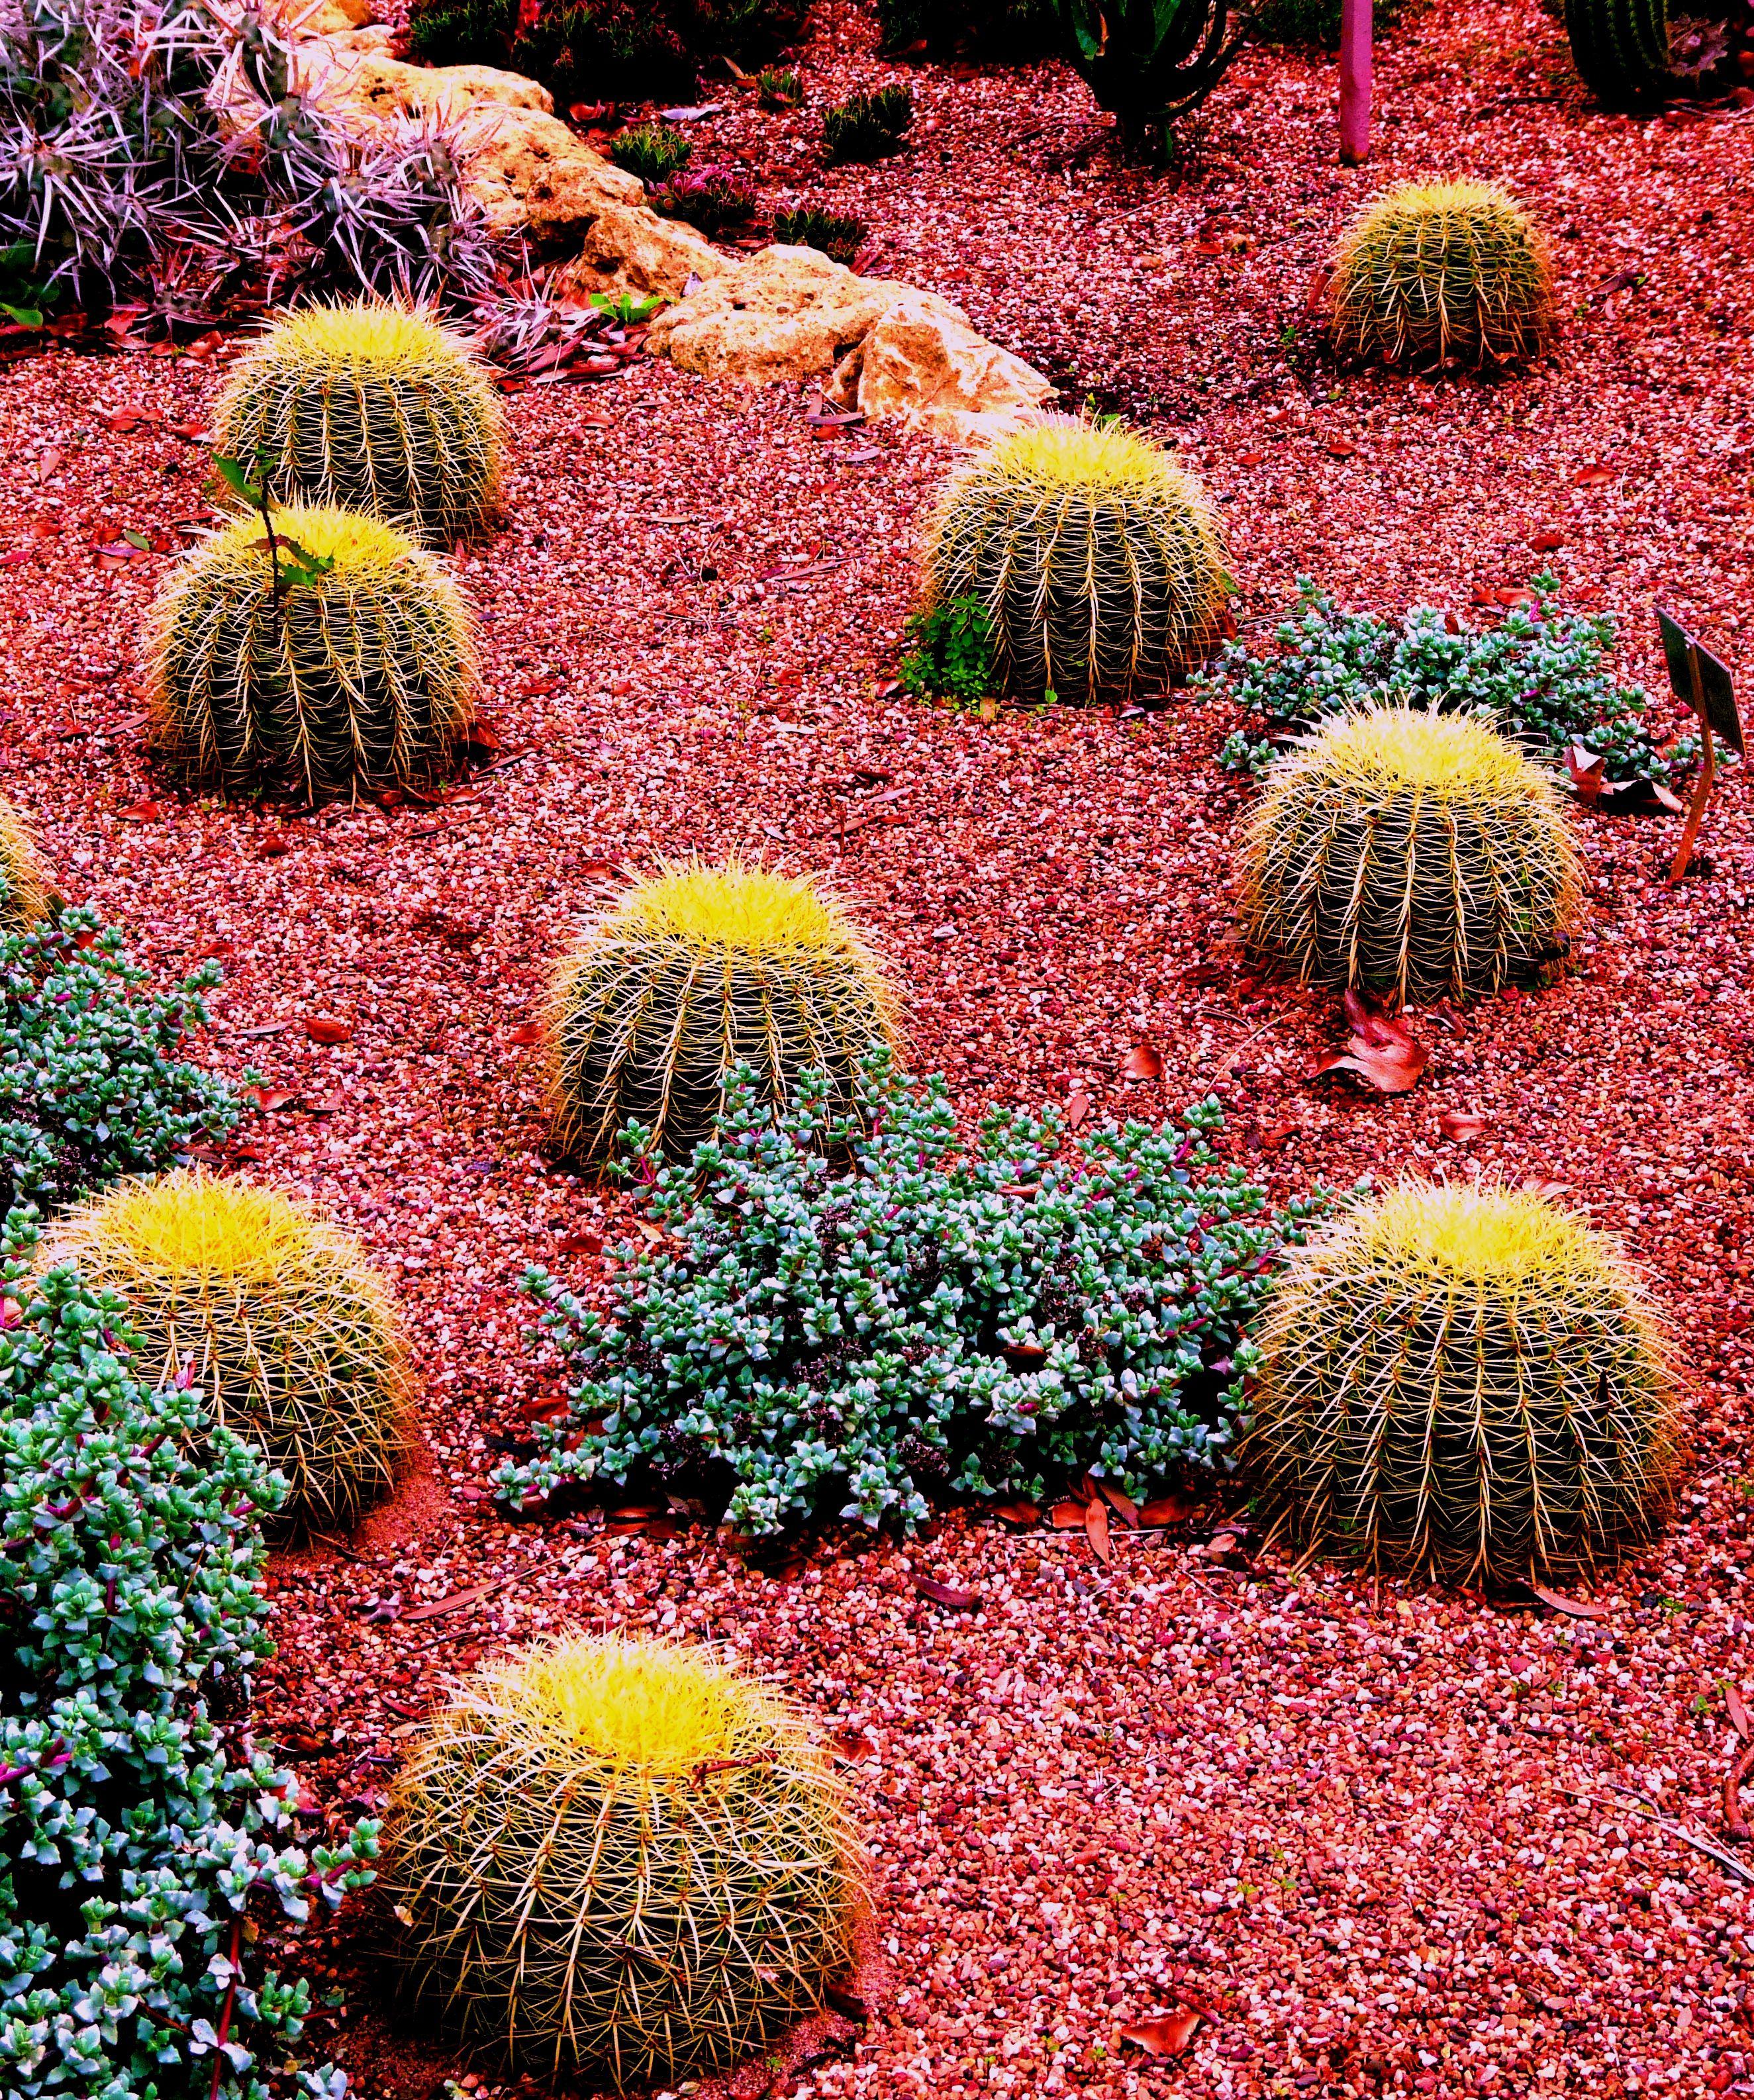 57 Amazing Beautiful Garden Ideas Inspiration And: Colorful Cactus Garden